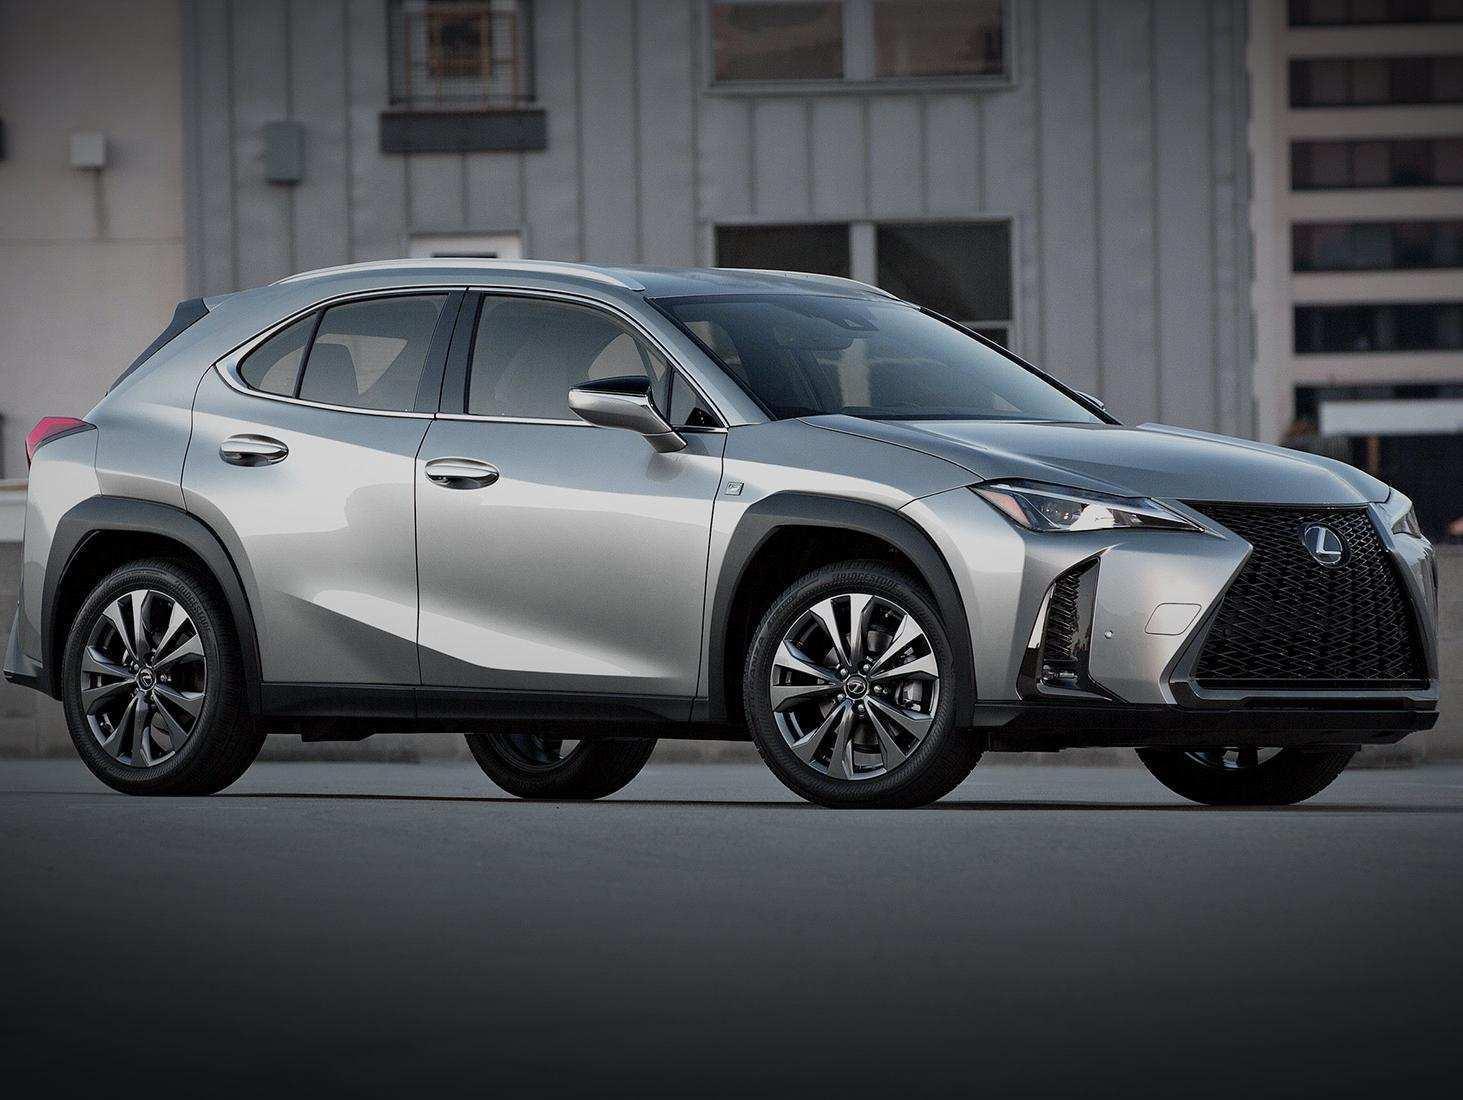 32 New Lexus 2020 Ux Exterior Date Spy Shoot with Lexus 2020 Ux Exterior Date